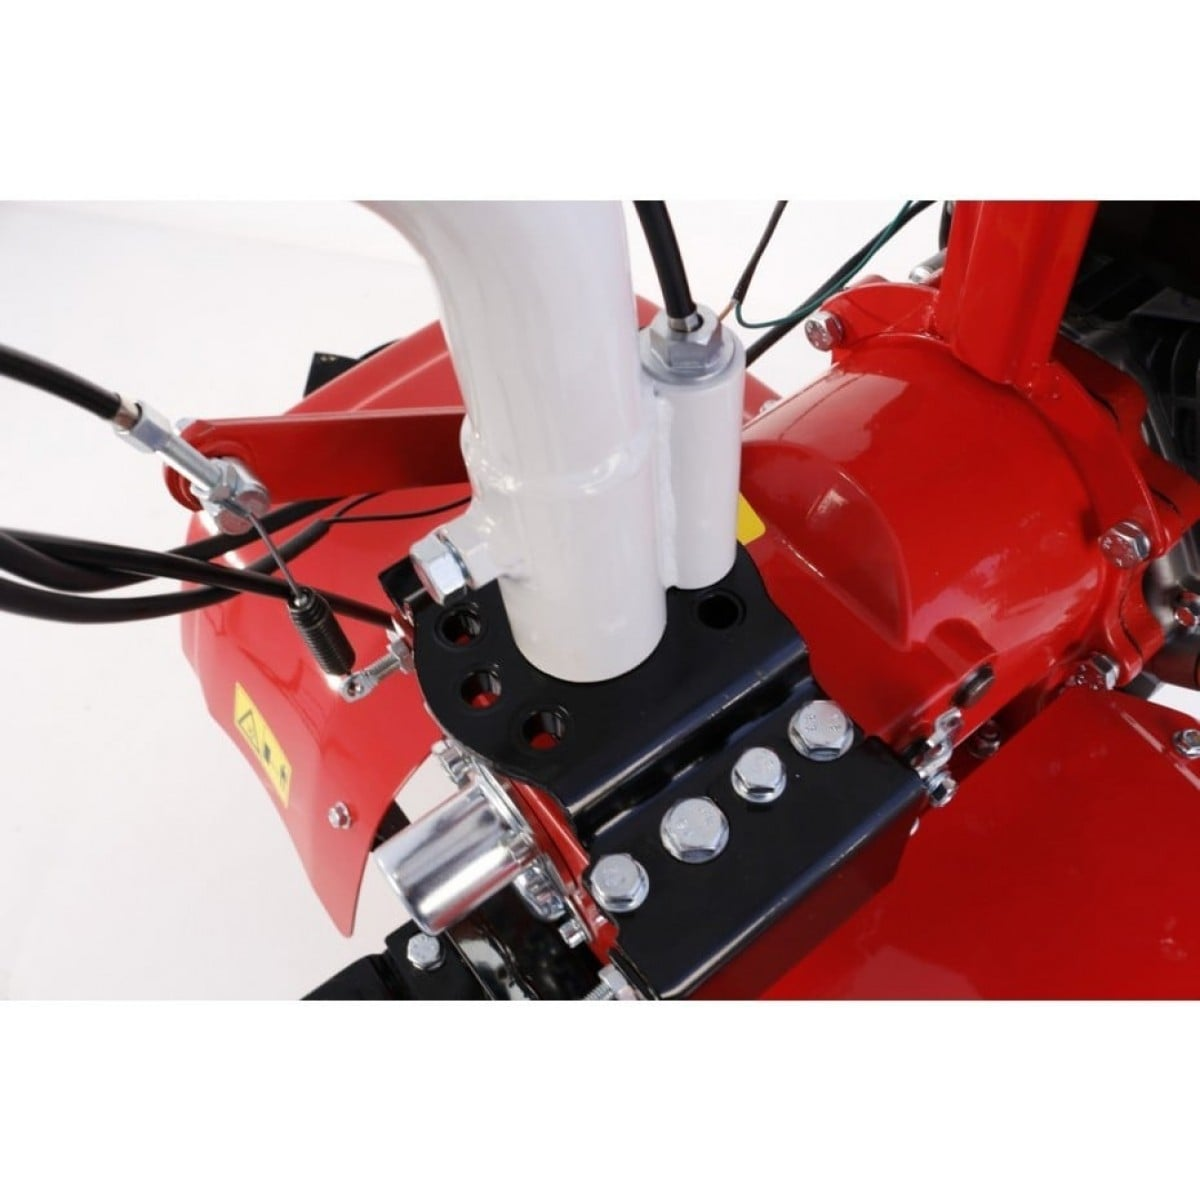 motocultor loncin lc1200 8cp o mac.ro 7 3 48